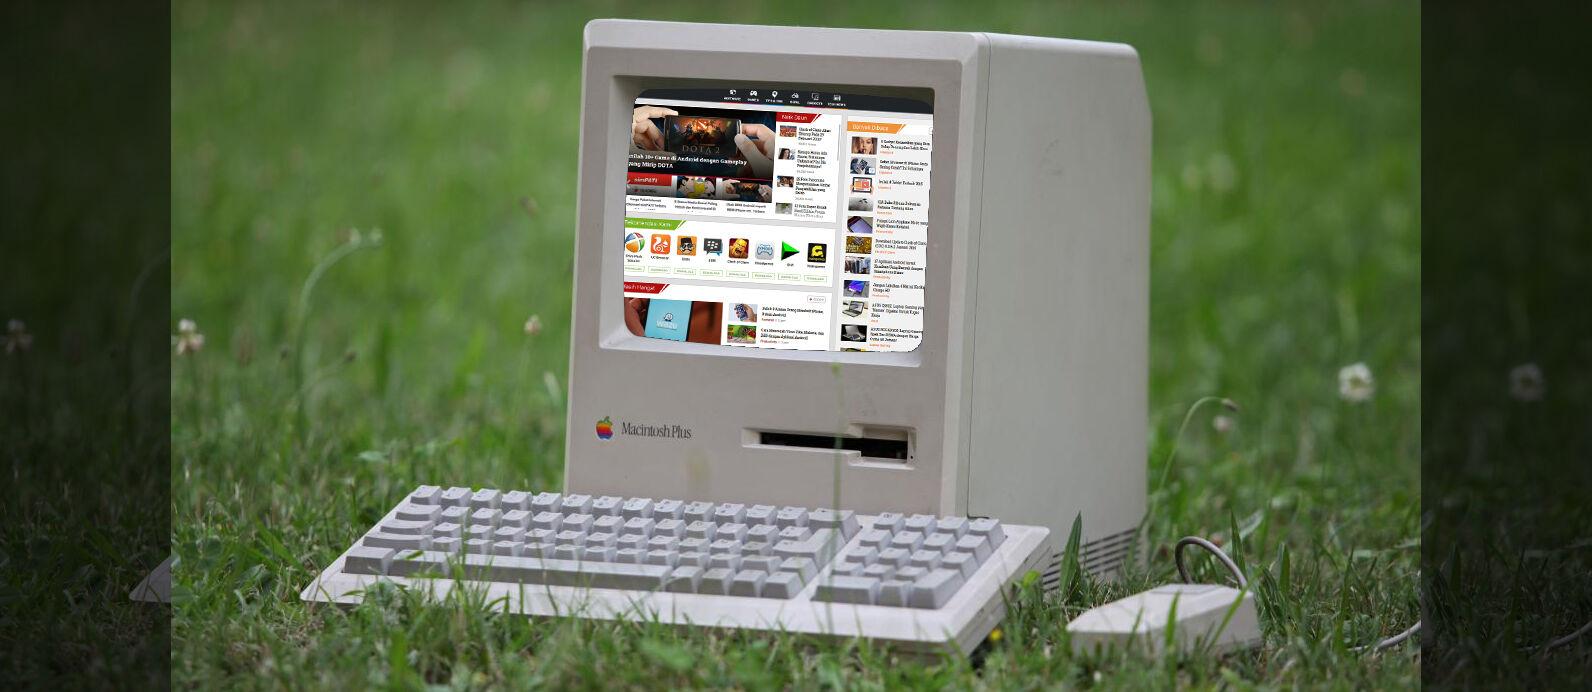 Begini Jadinya Kalau PC Jadul Tahun 80-an Dipakai Browsing